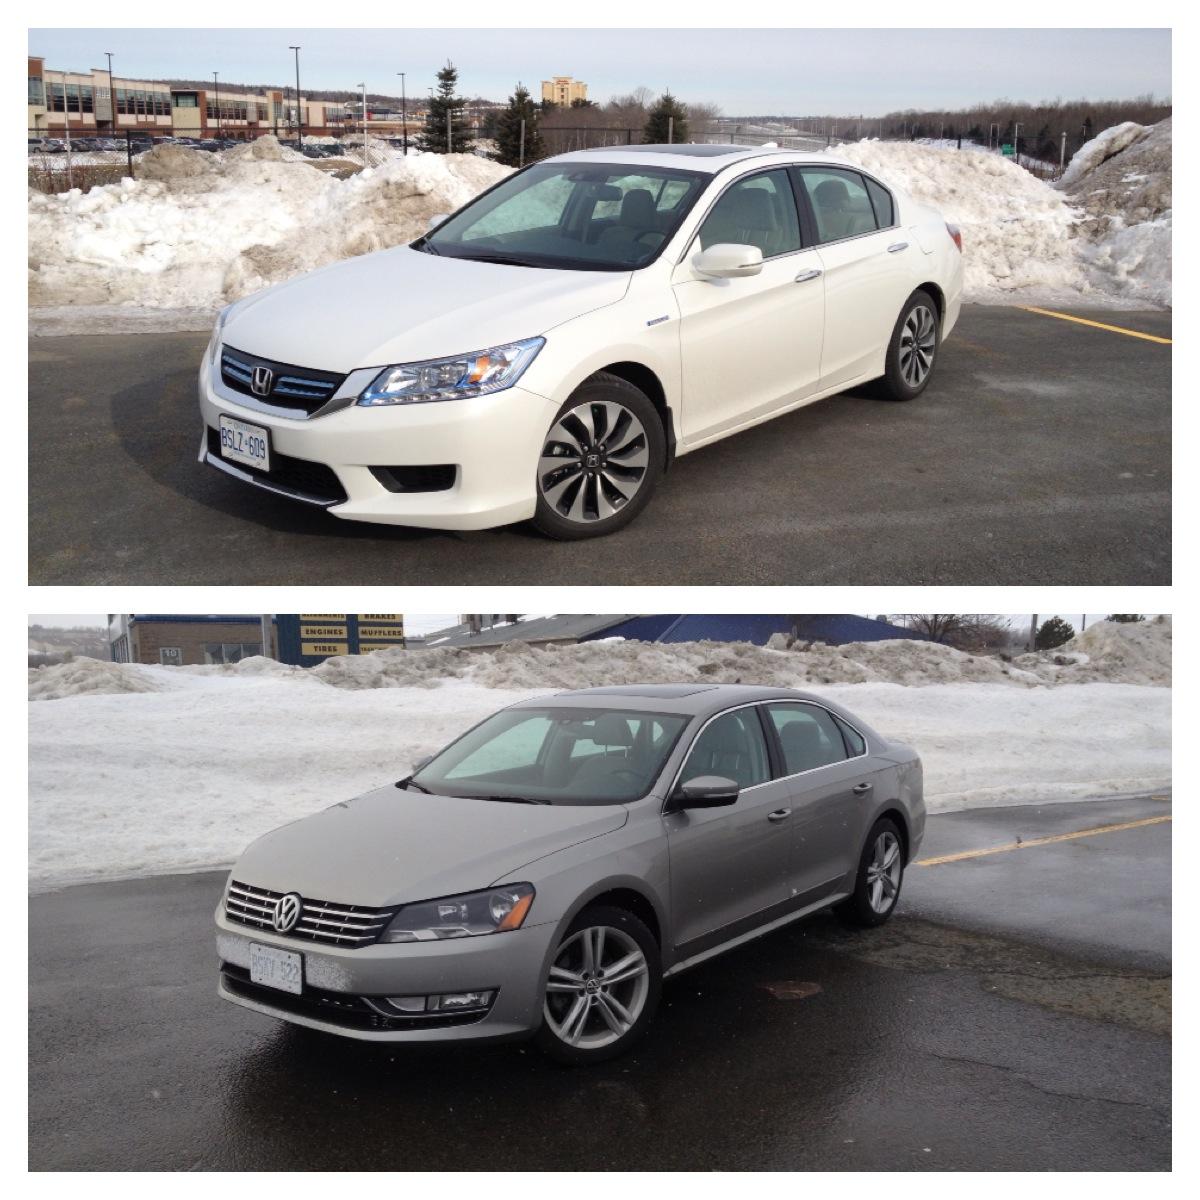 Comparison: 2014 Honda Accord Hybrid Touring Vs. 2014